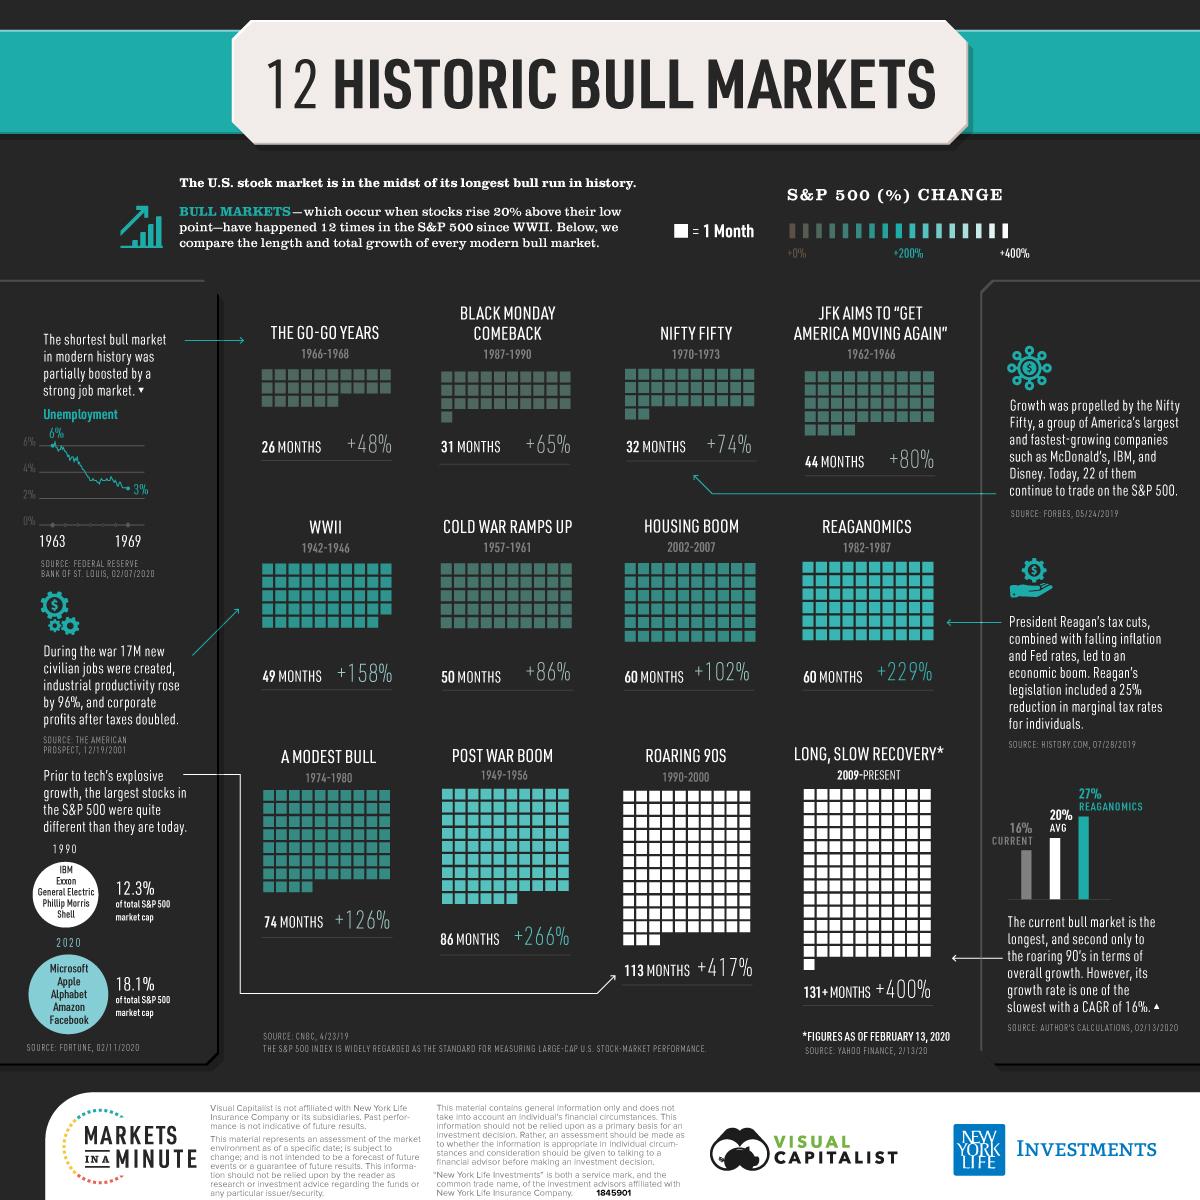 12 historic bull markets